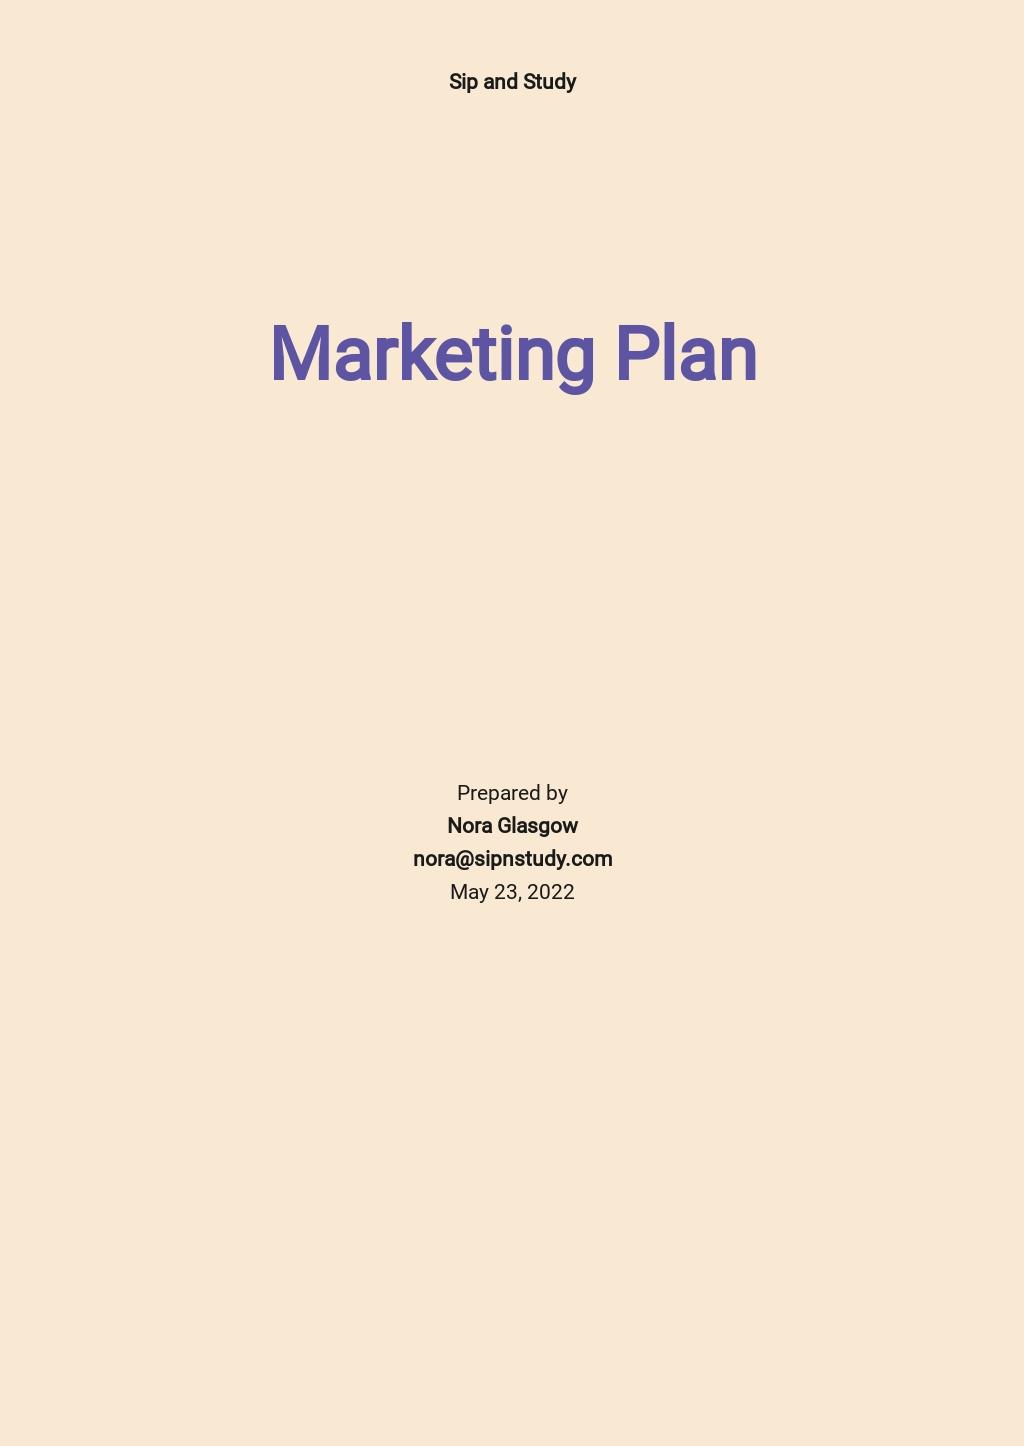 Sample Restaurant Marketing Plan Template .jpe